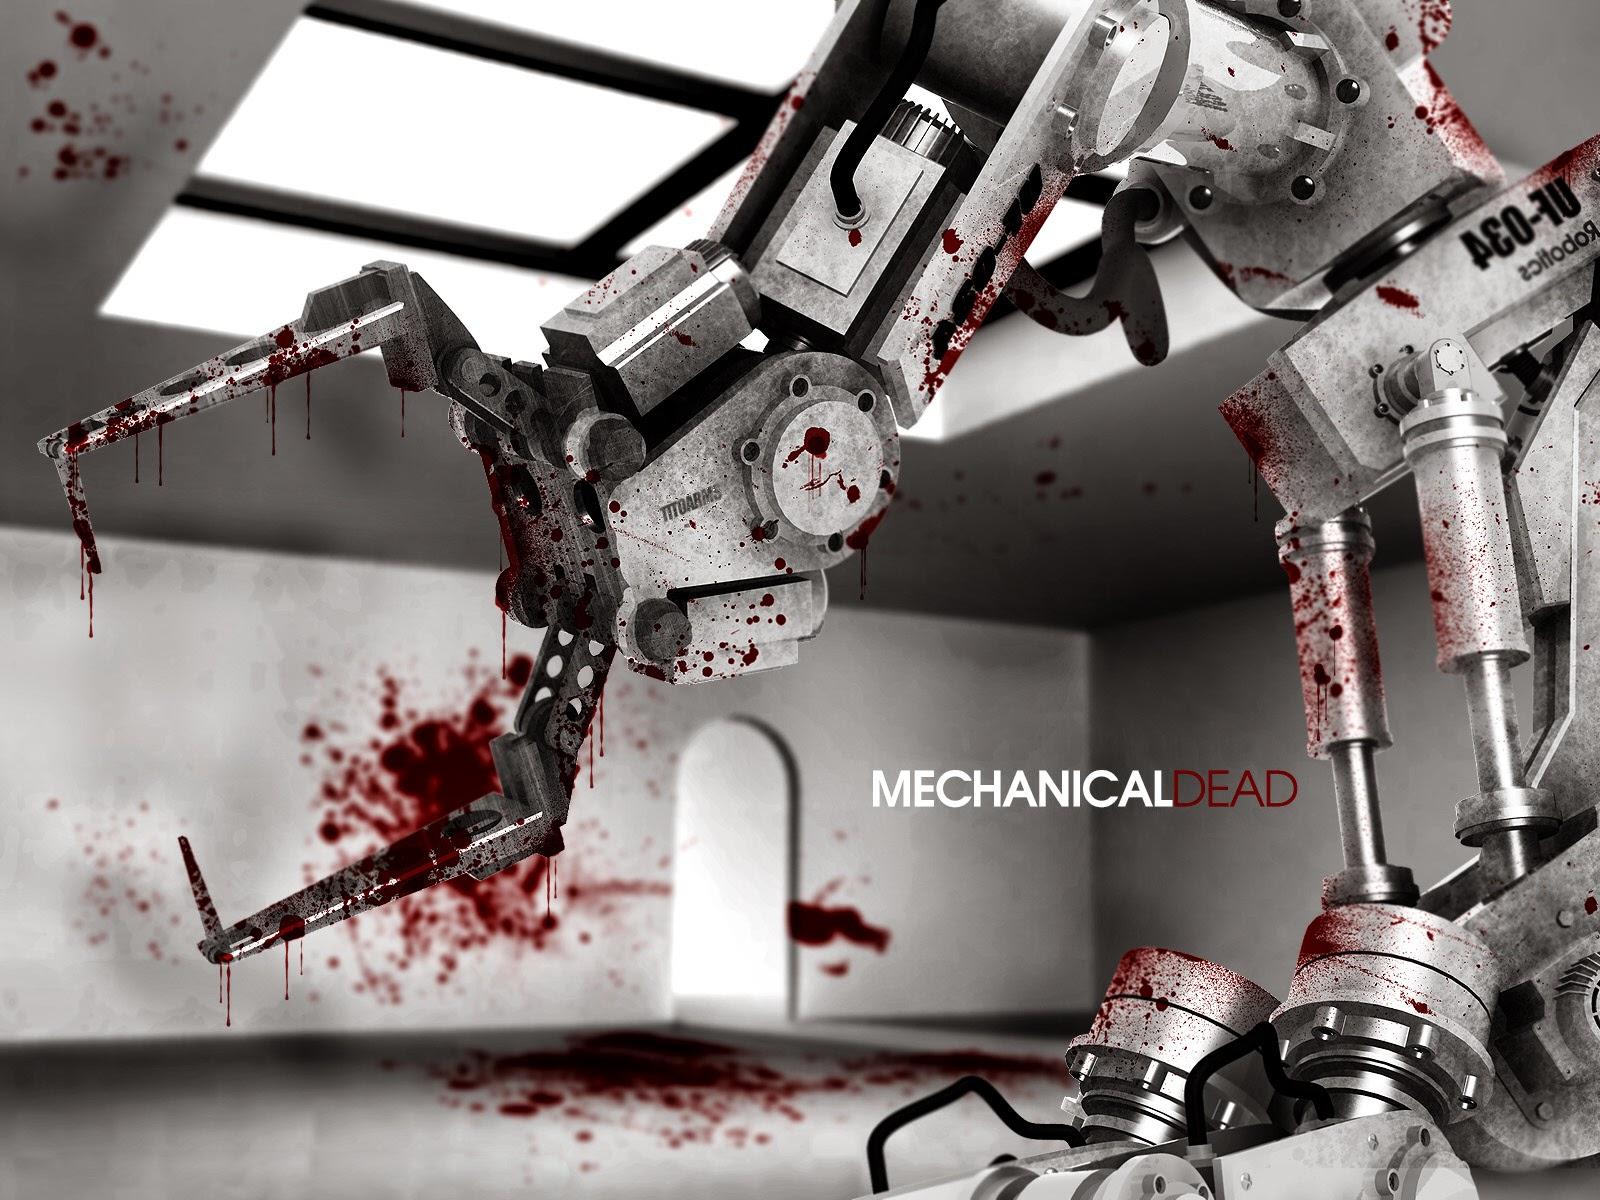 Abstract Killer machine hd wallpaper